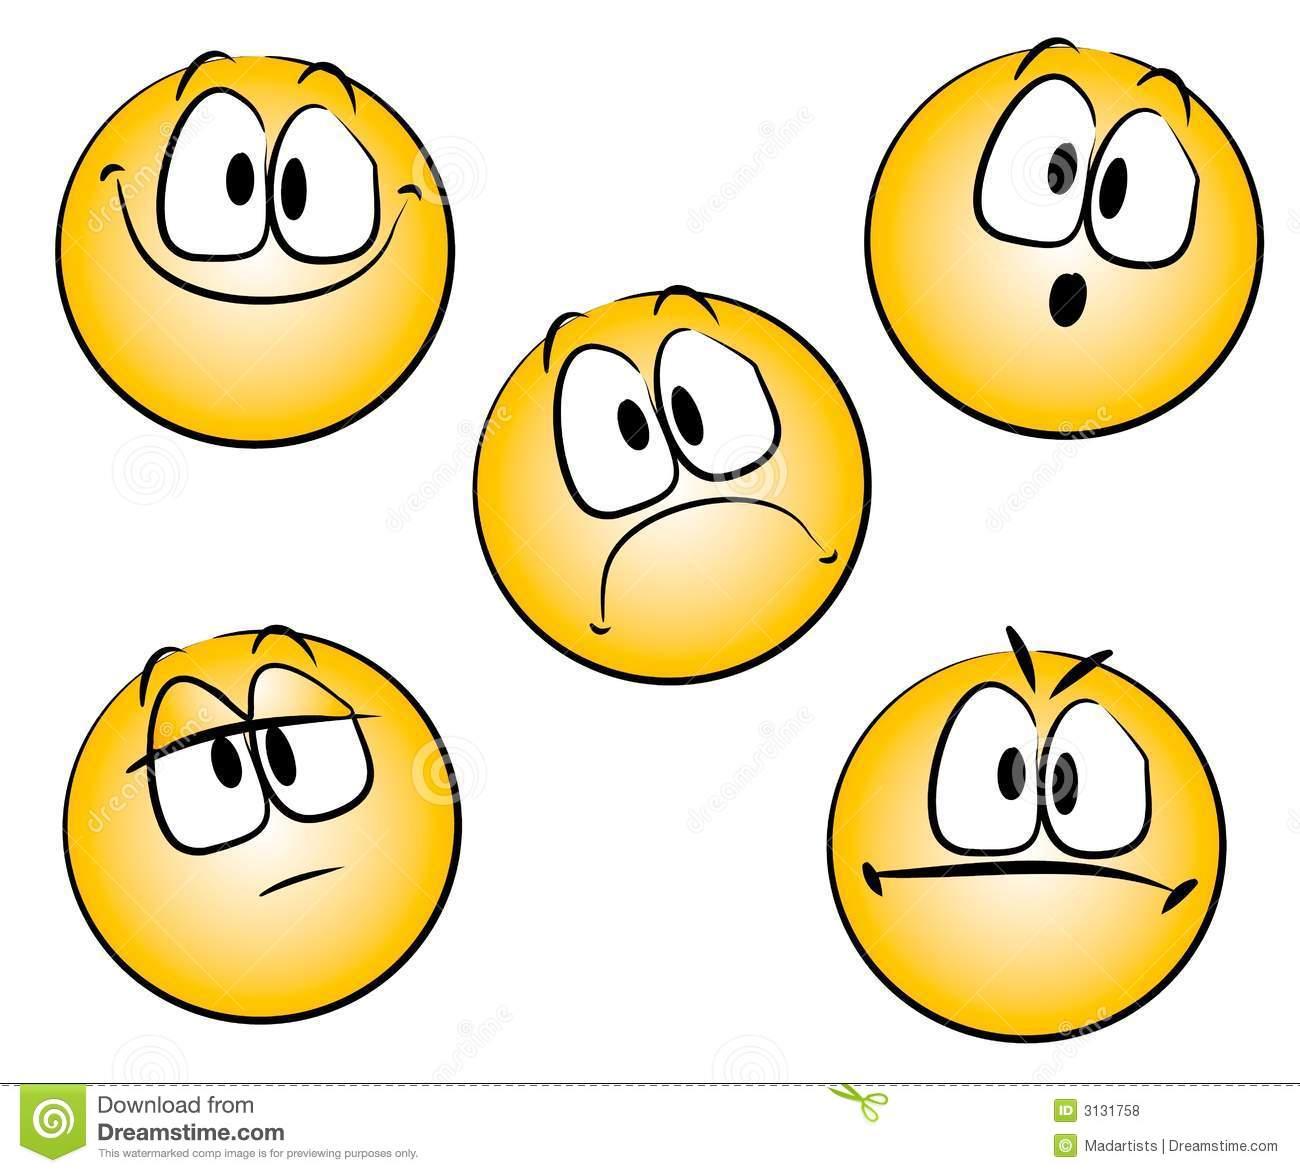 Emoticons Smileys Clip Art Royalty Free -Emoticons Smileys Clip Art Royalty Free Stock Photos Image 3131758-4